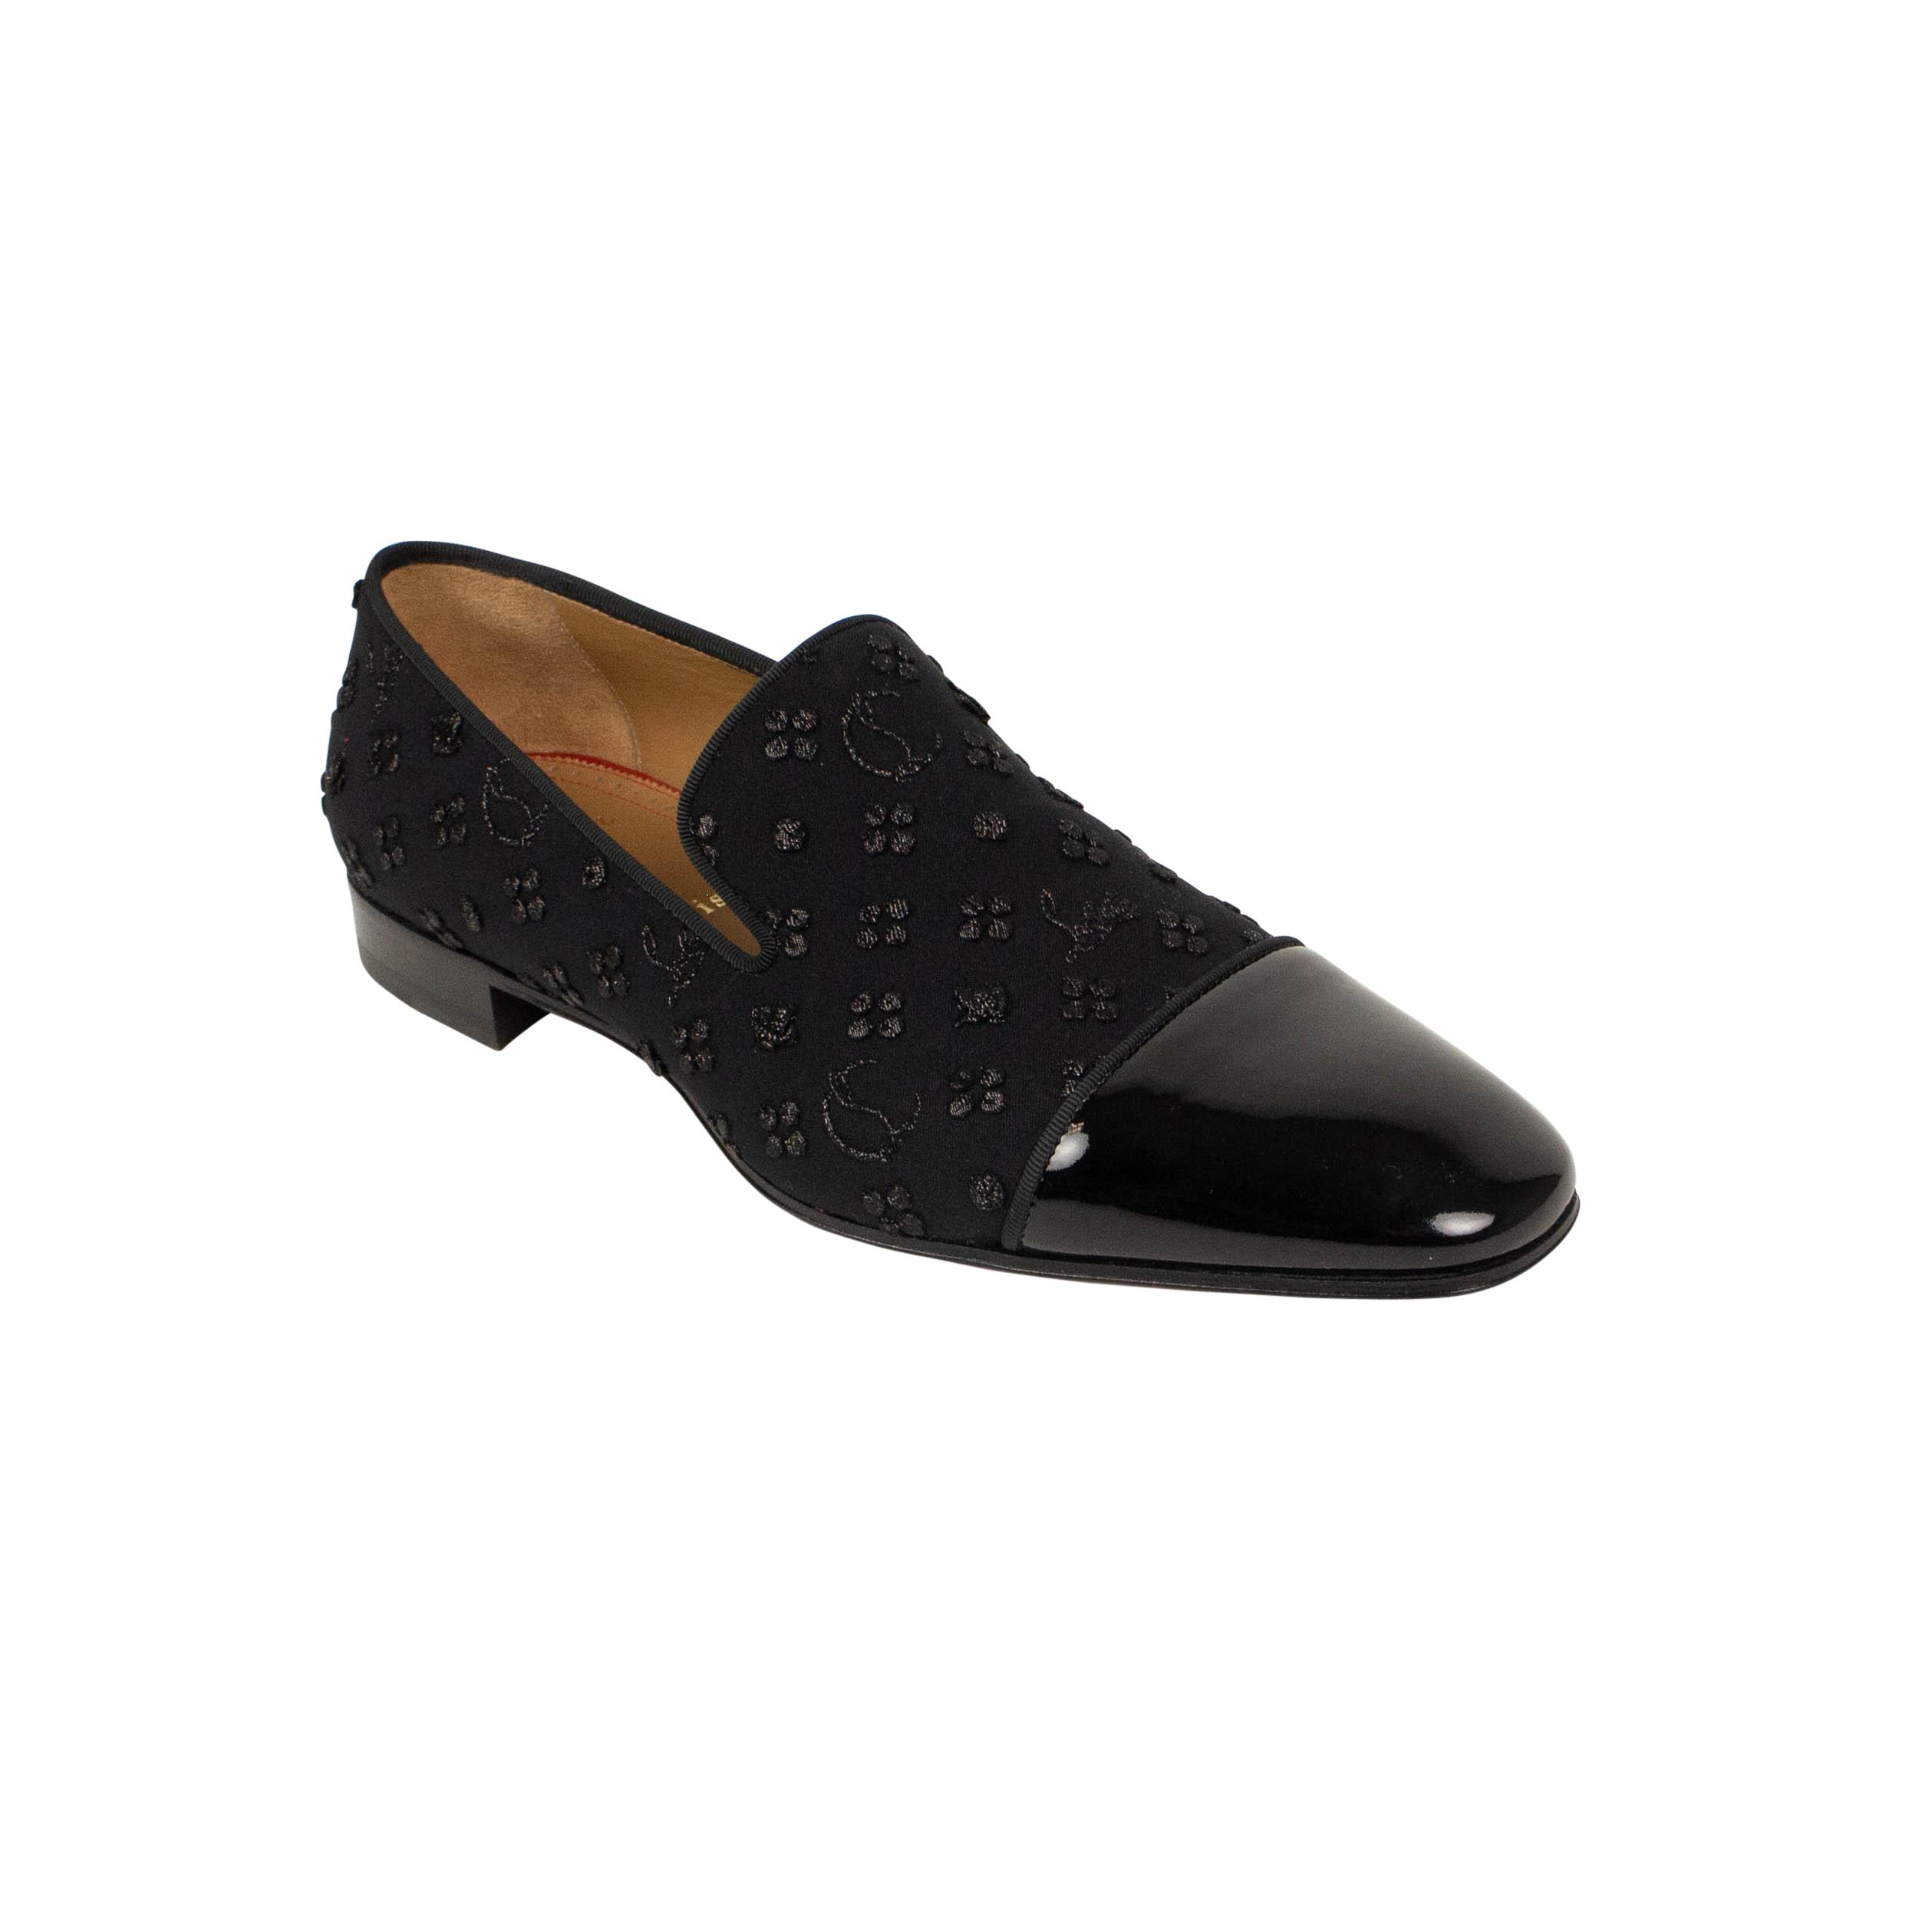 f5a824250 Christian Louboutin ×. Black Jacquard And Patent Dandelion Loafers Shoes.  Size: US 8 / EU 41